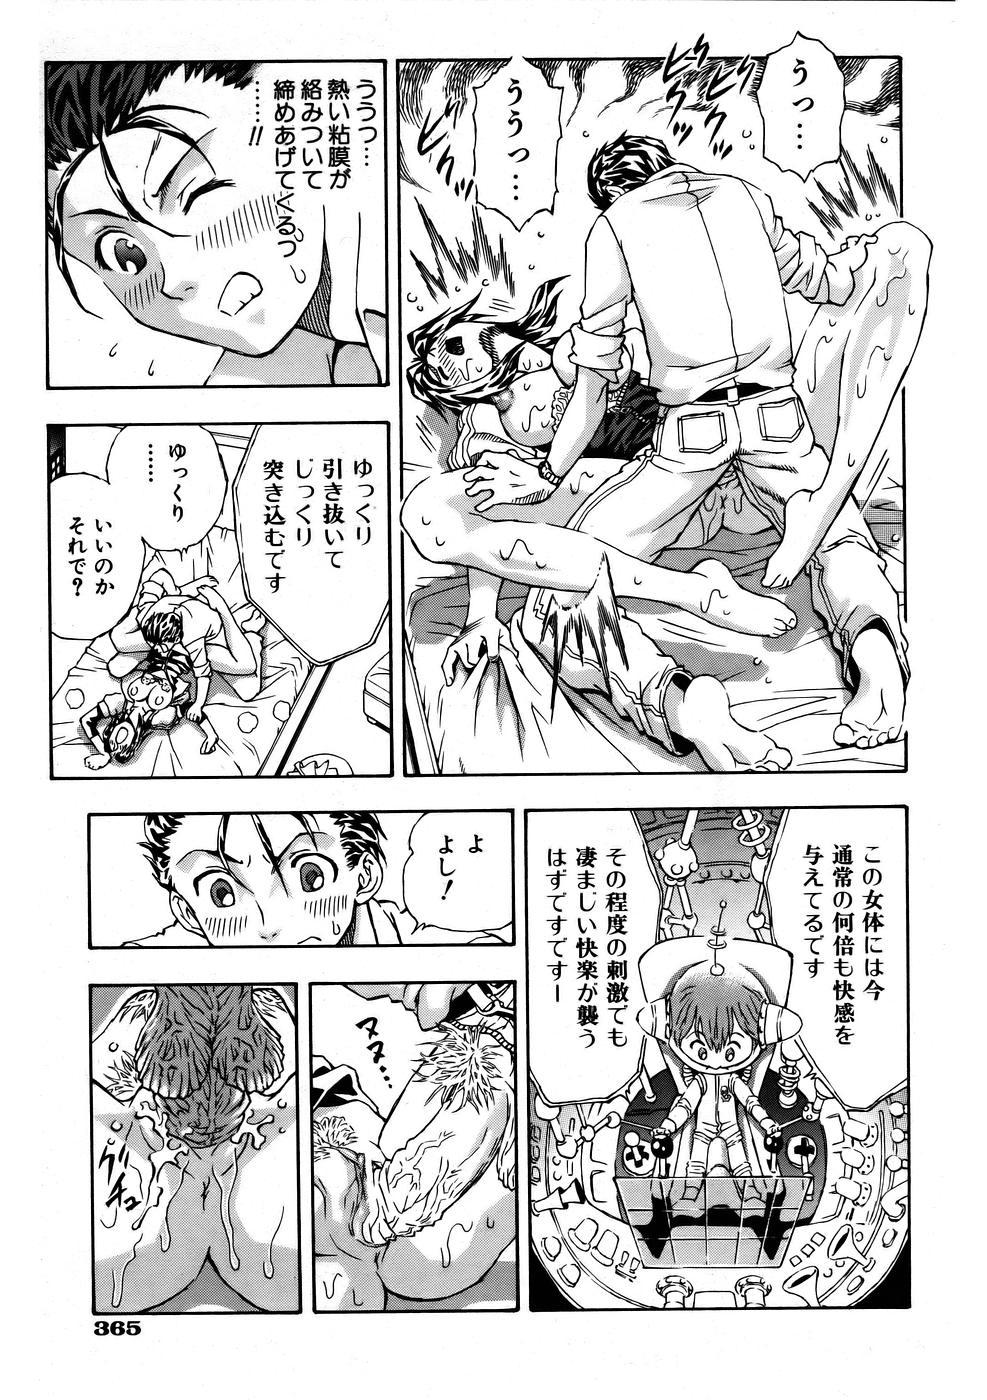 COMIC AUN 2005-10 Vol. 113 362